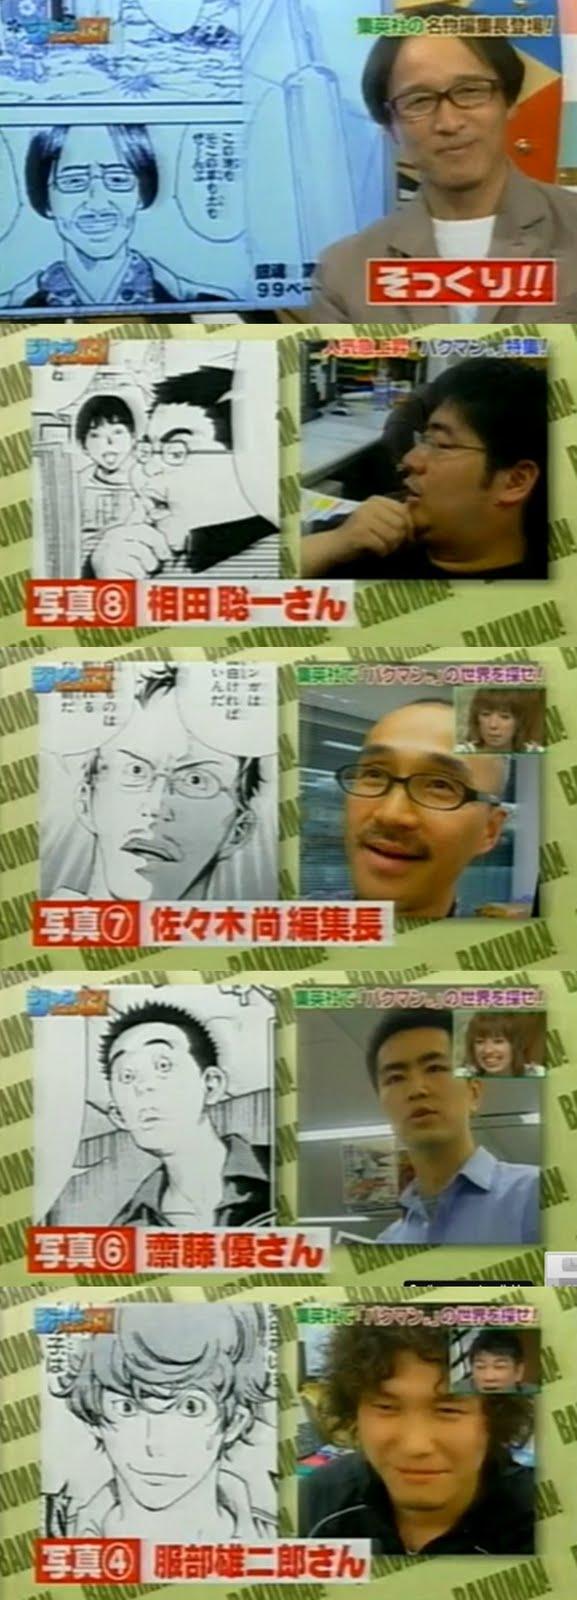 Curiosidades de Bakuman - Animefanzines